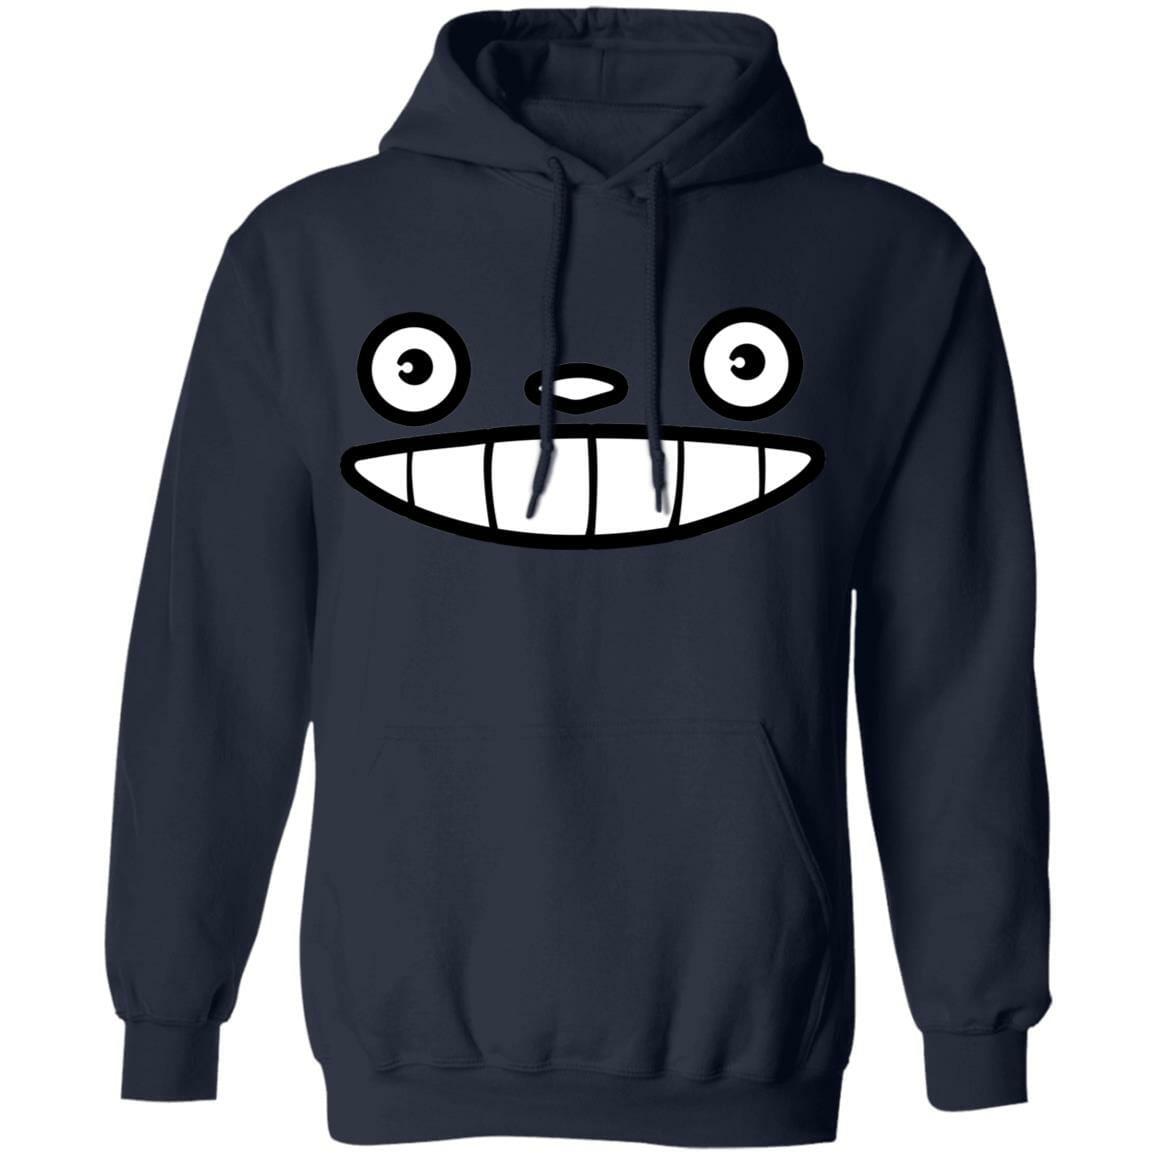 My Neighbor Totoro Face Hoodie